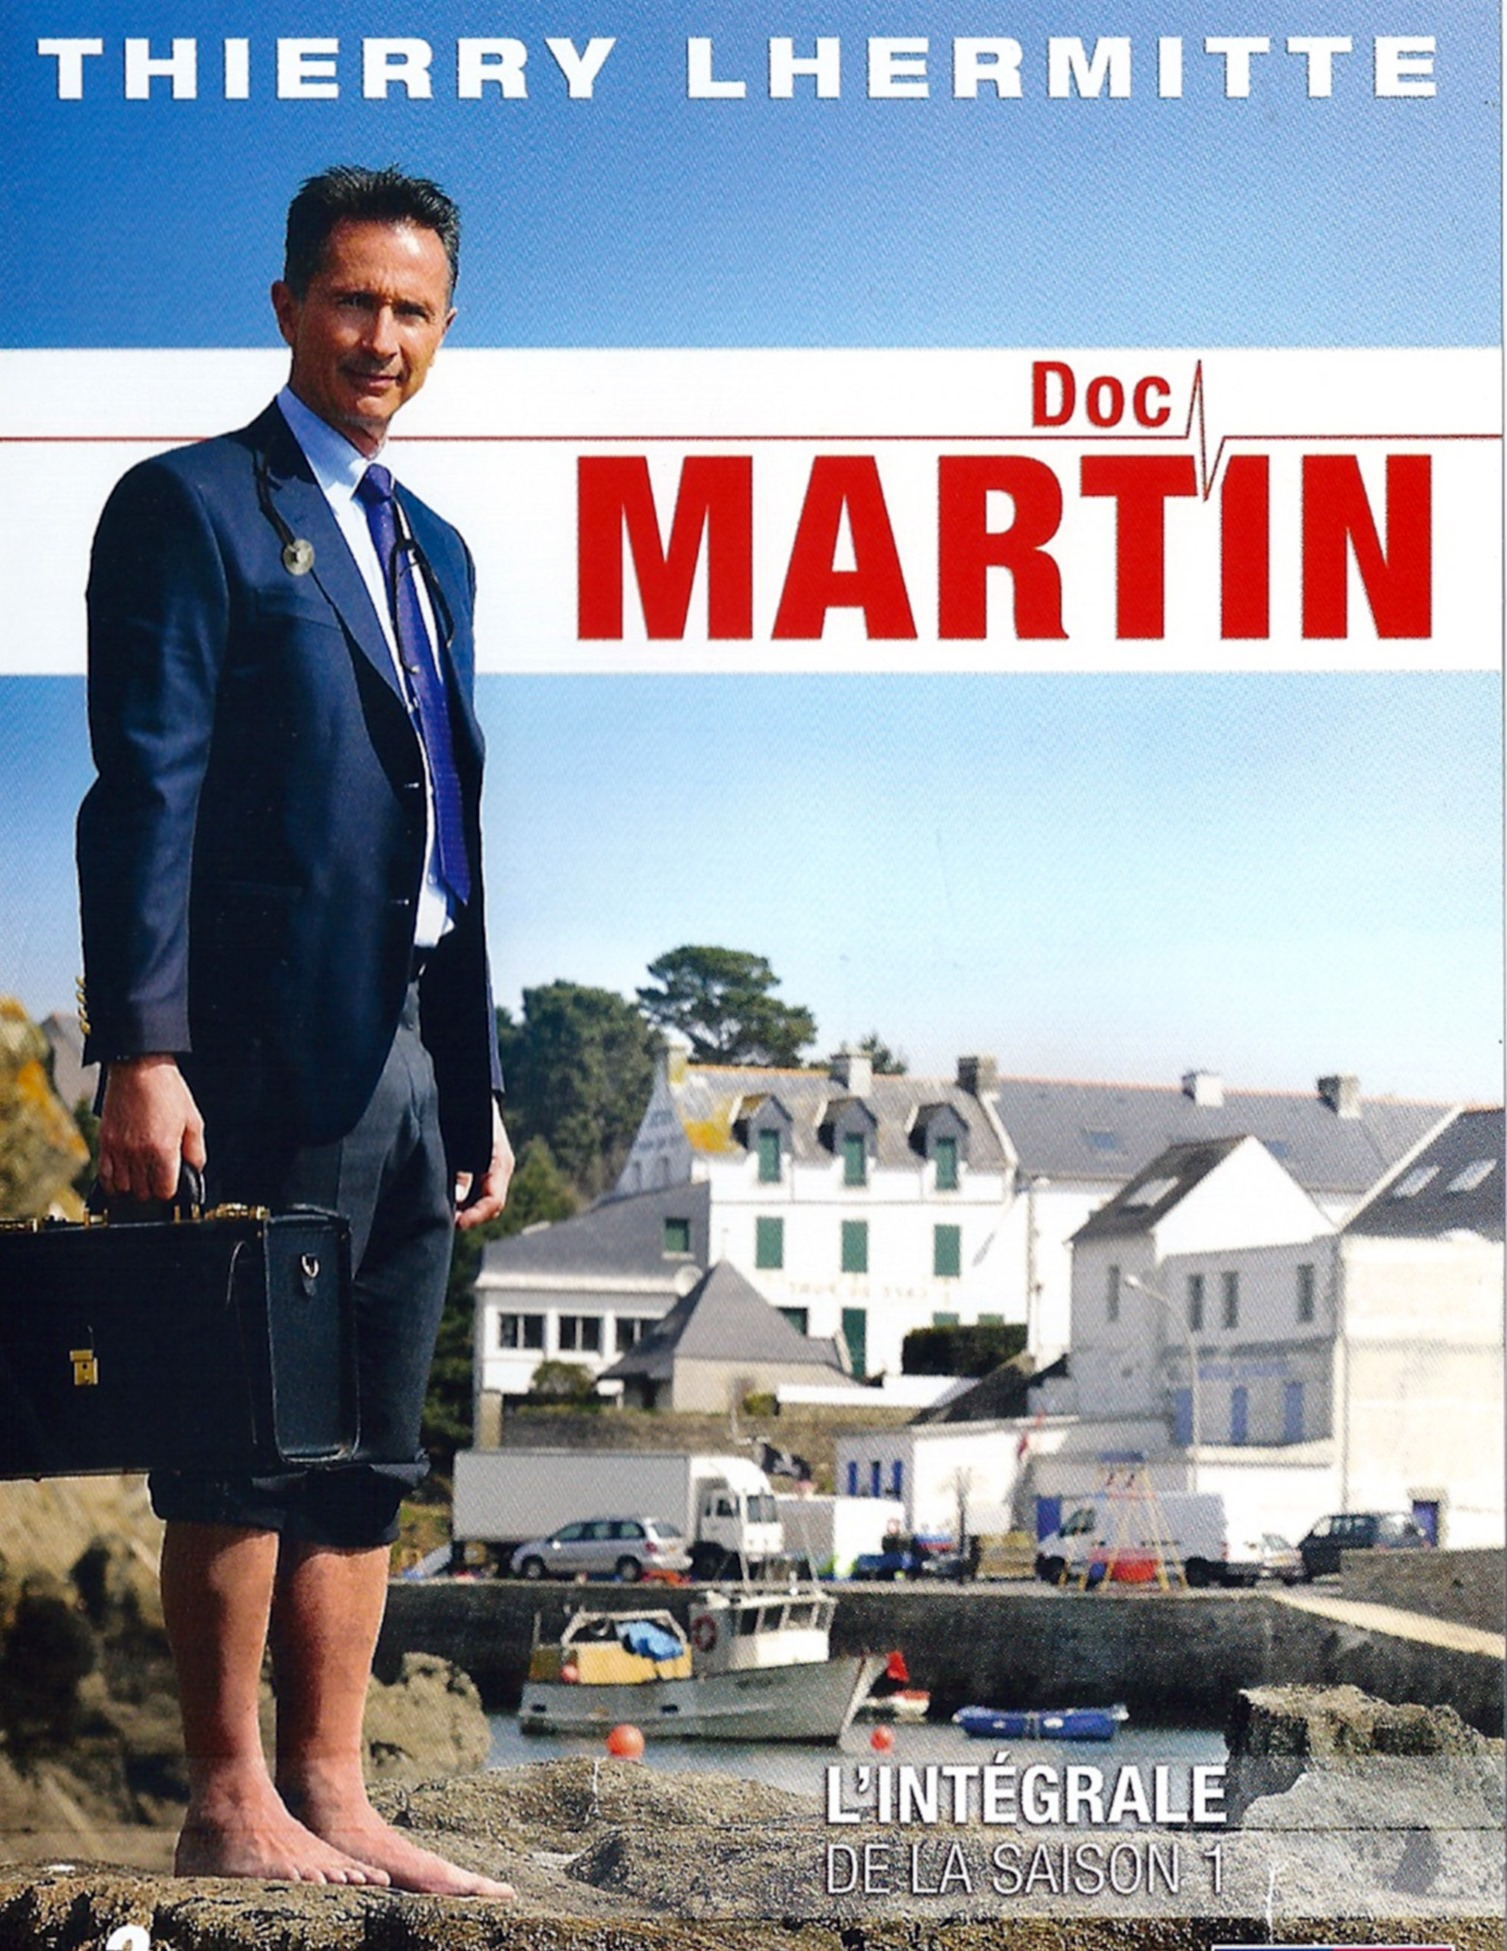 doc martin season 4 download